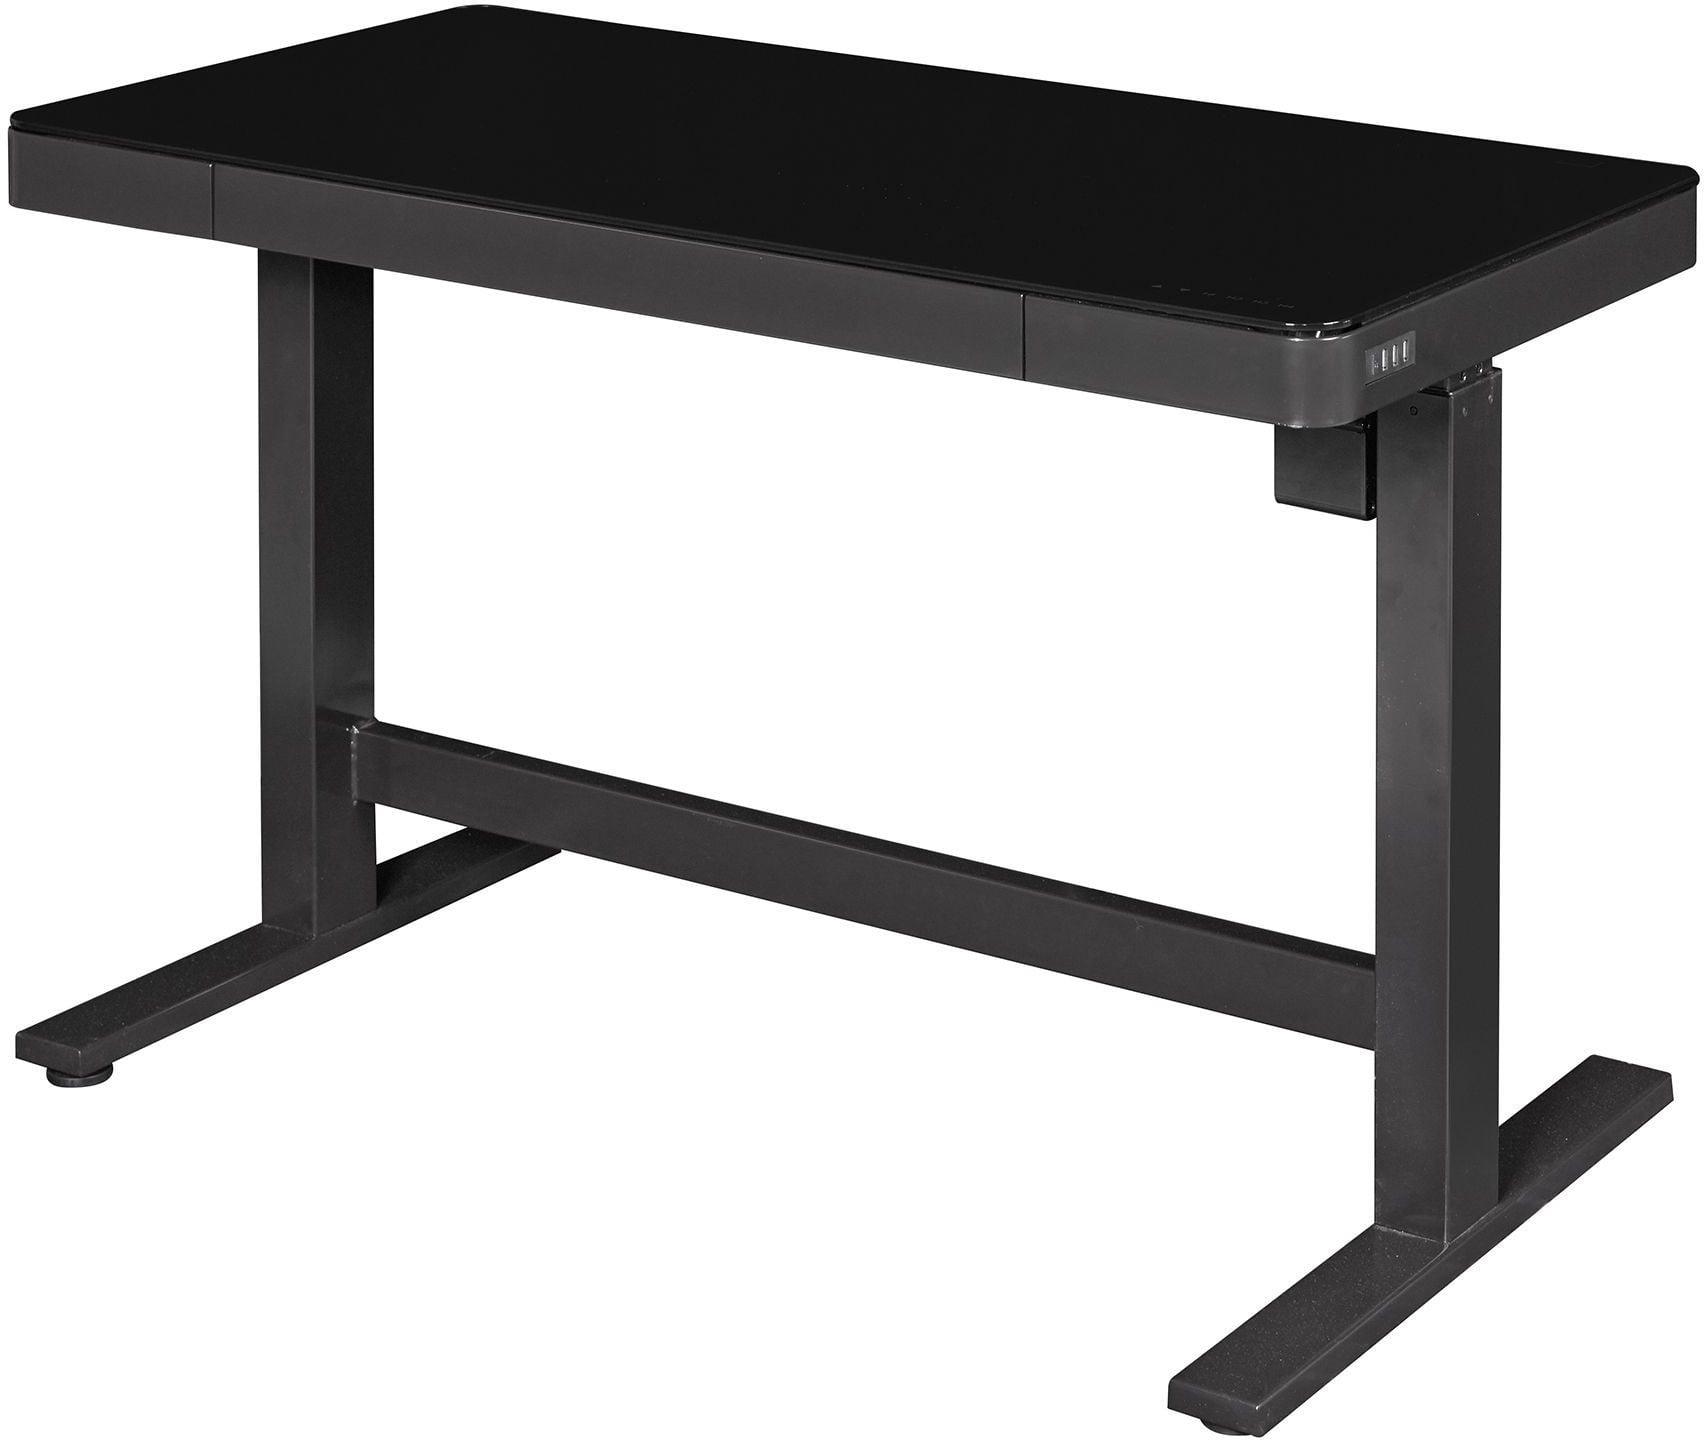 Bell O Black Adjustable Height Desk Odp10444 48d913 Twin